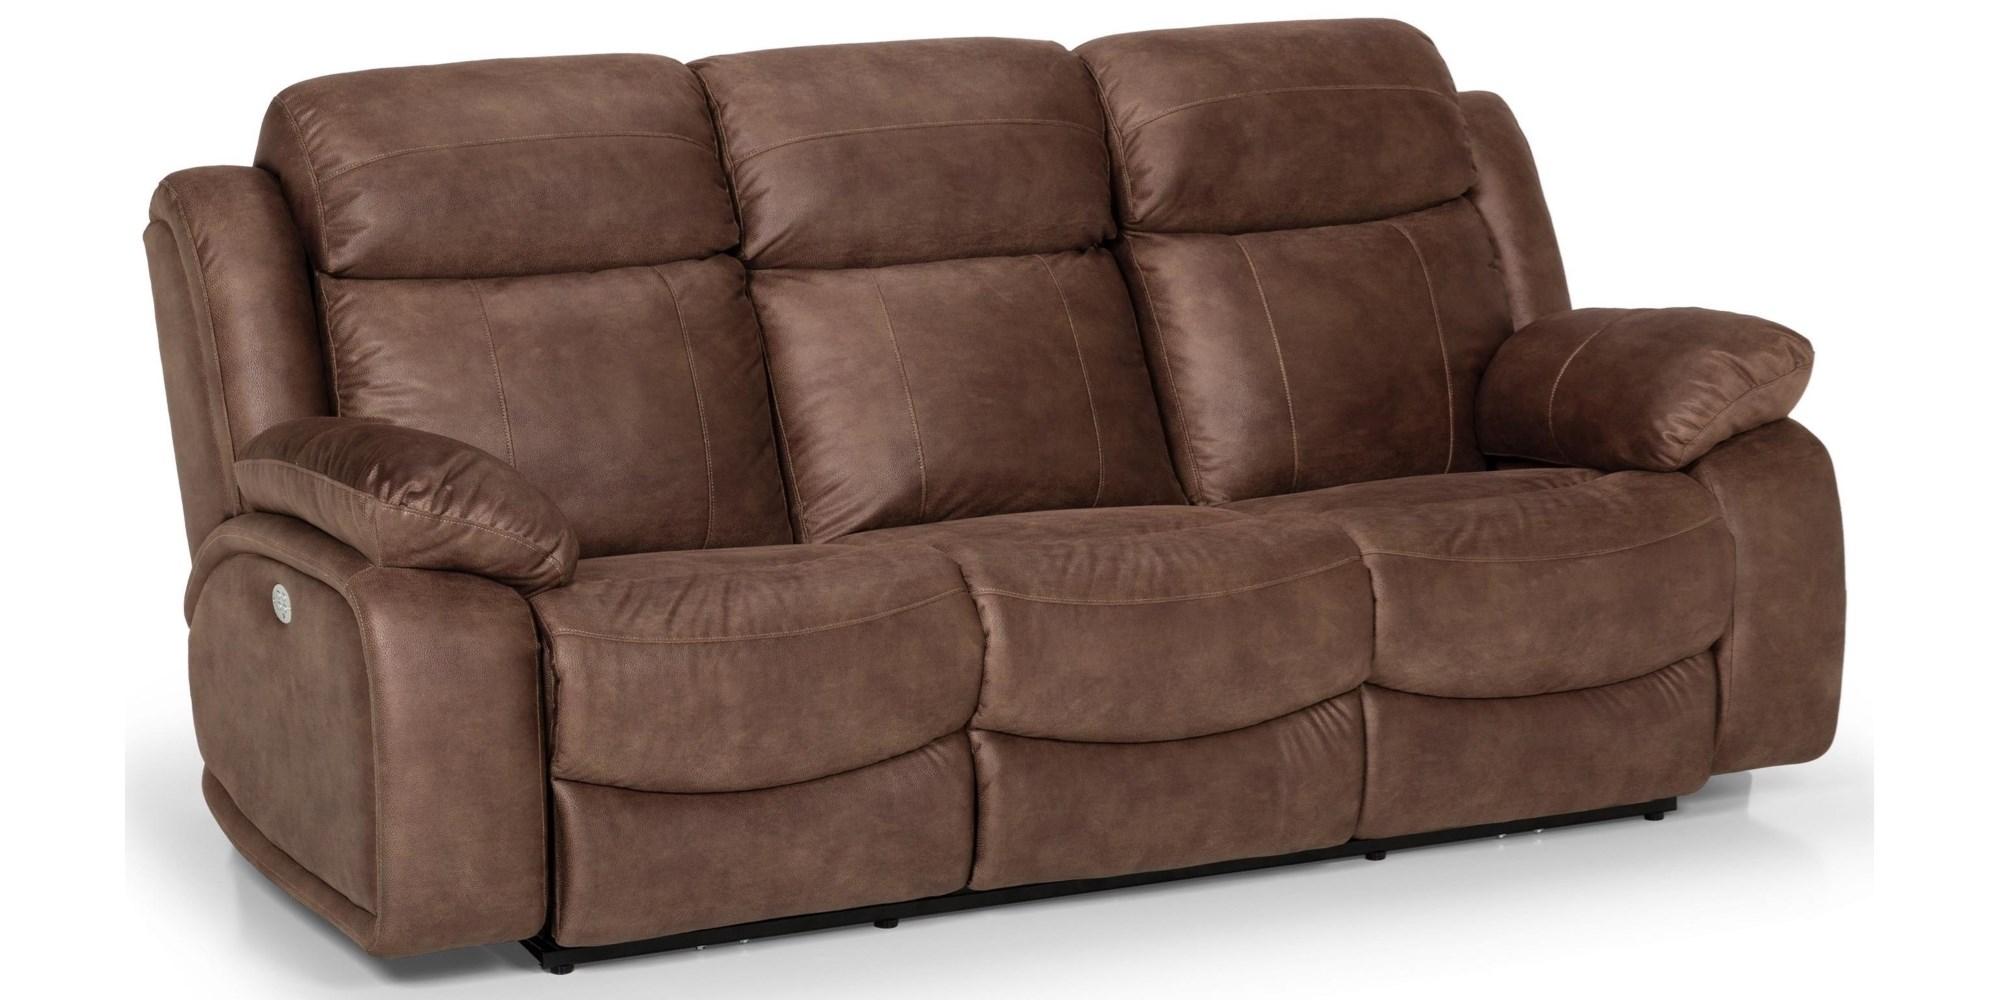 Stanton 853 Reclining Sofa